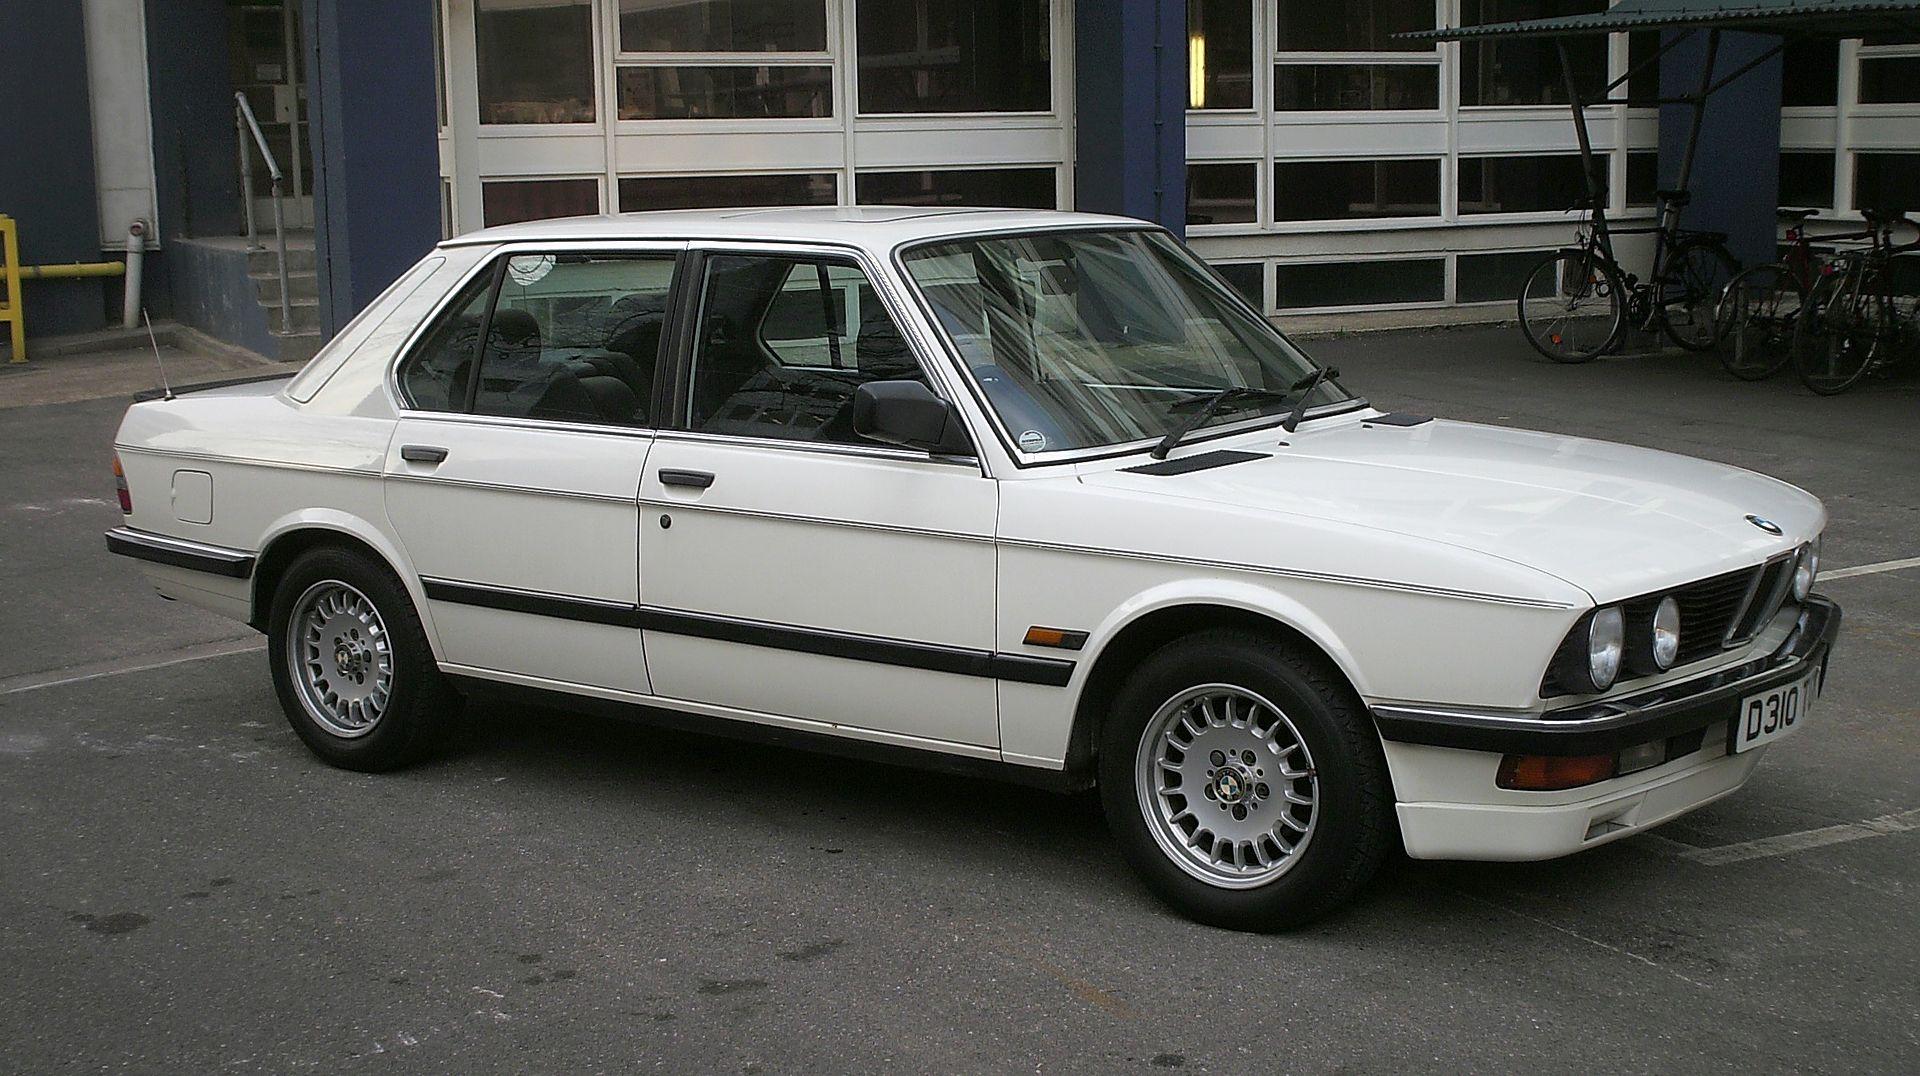 2 BLANK KEY BMW 3 5 7 SERIES E31 E32 E34 E36 318i 325i 525i M5 735i 840i GERMANY